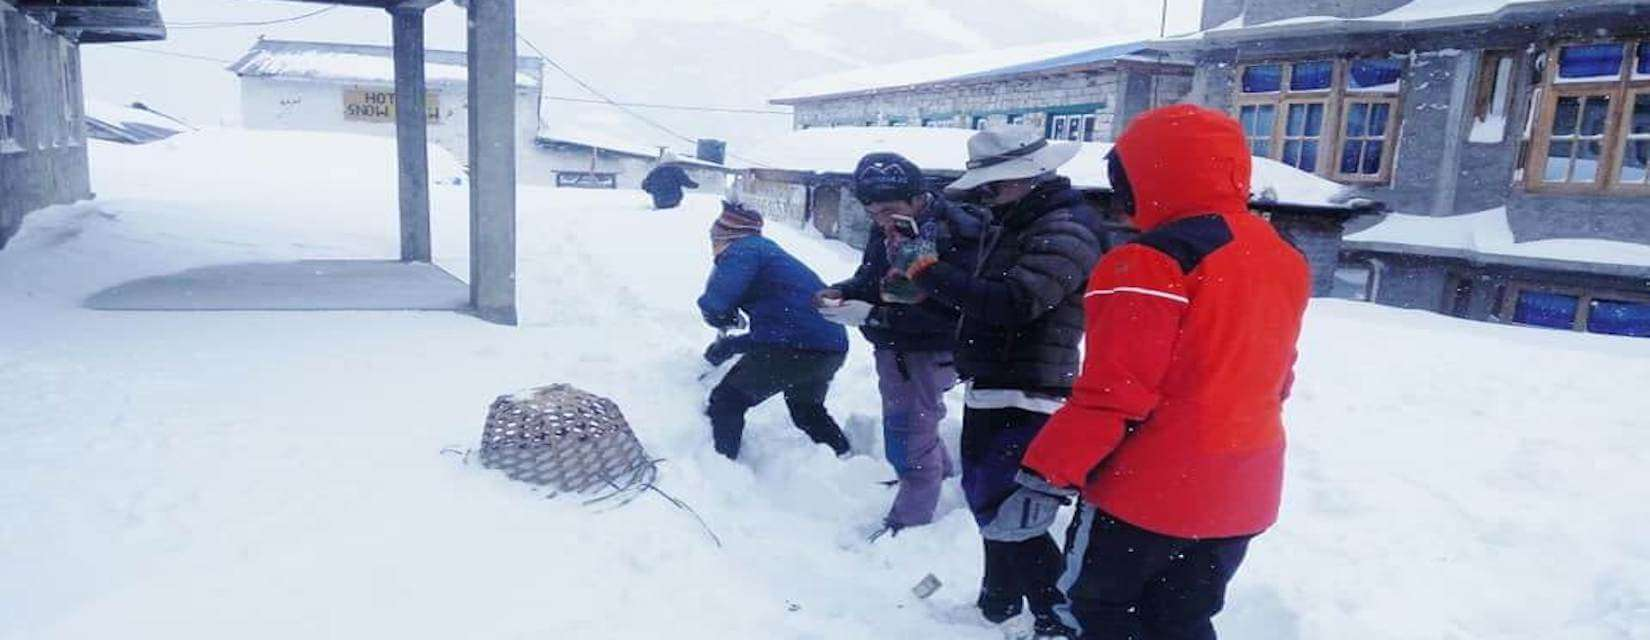 Best Beginner Treks in Nepal